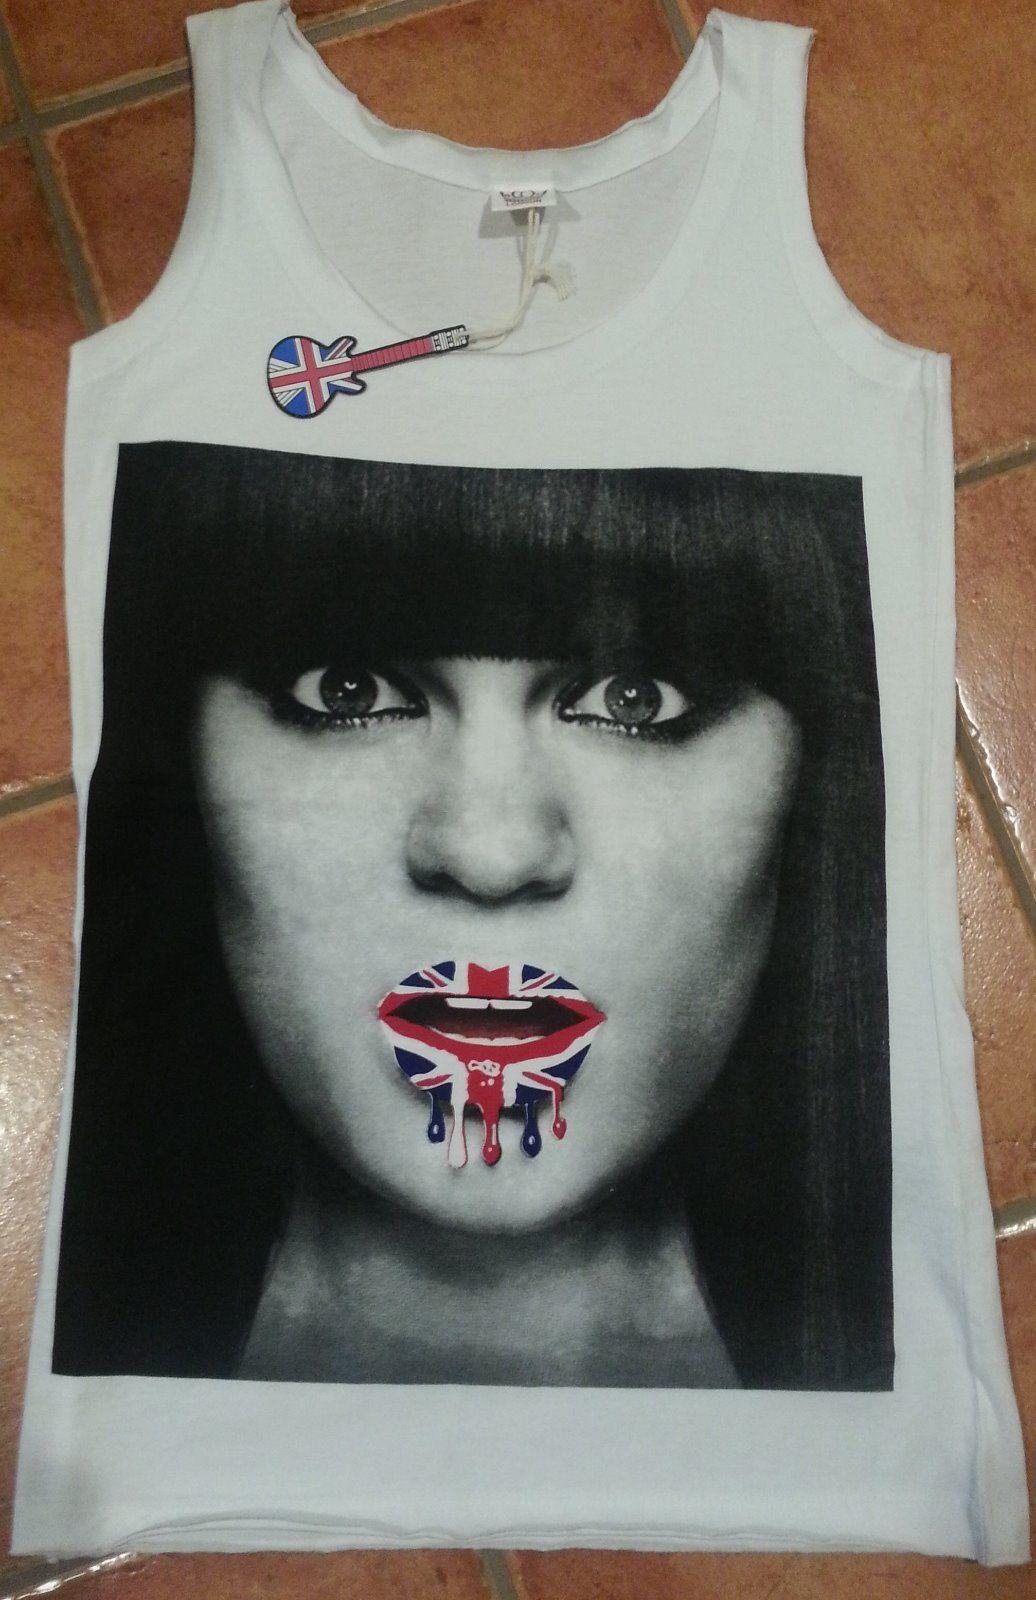 b28edda3501df4 Jessie J Womens Womens Tank Top White Cotton and 50 similar items